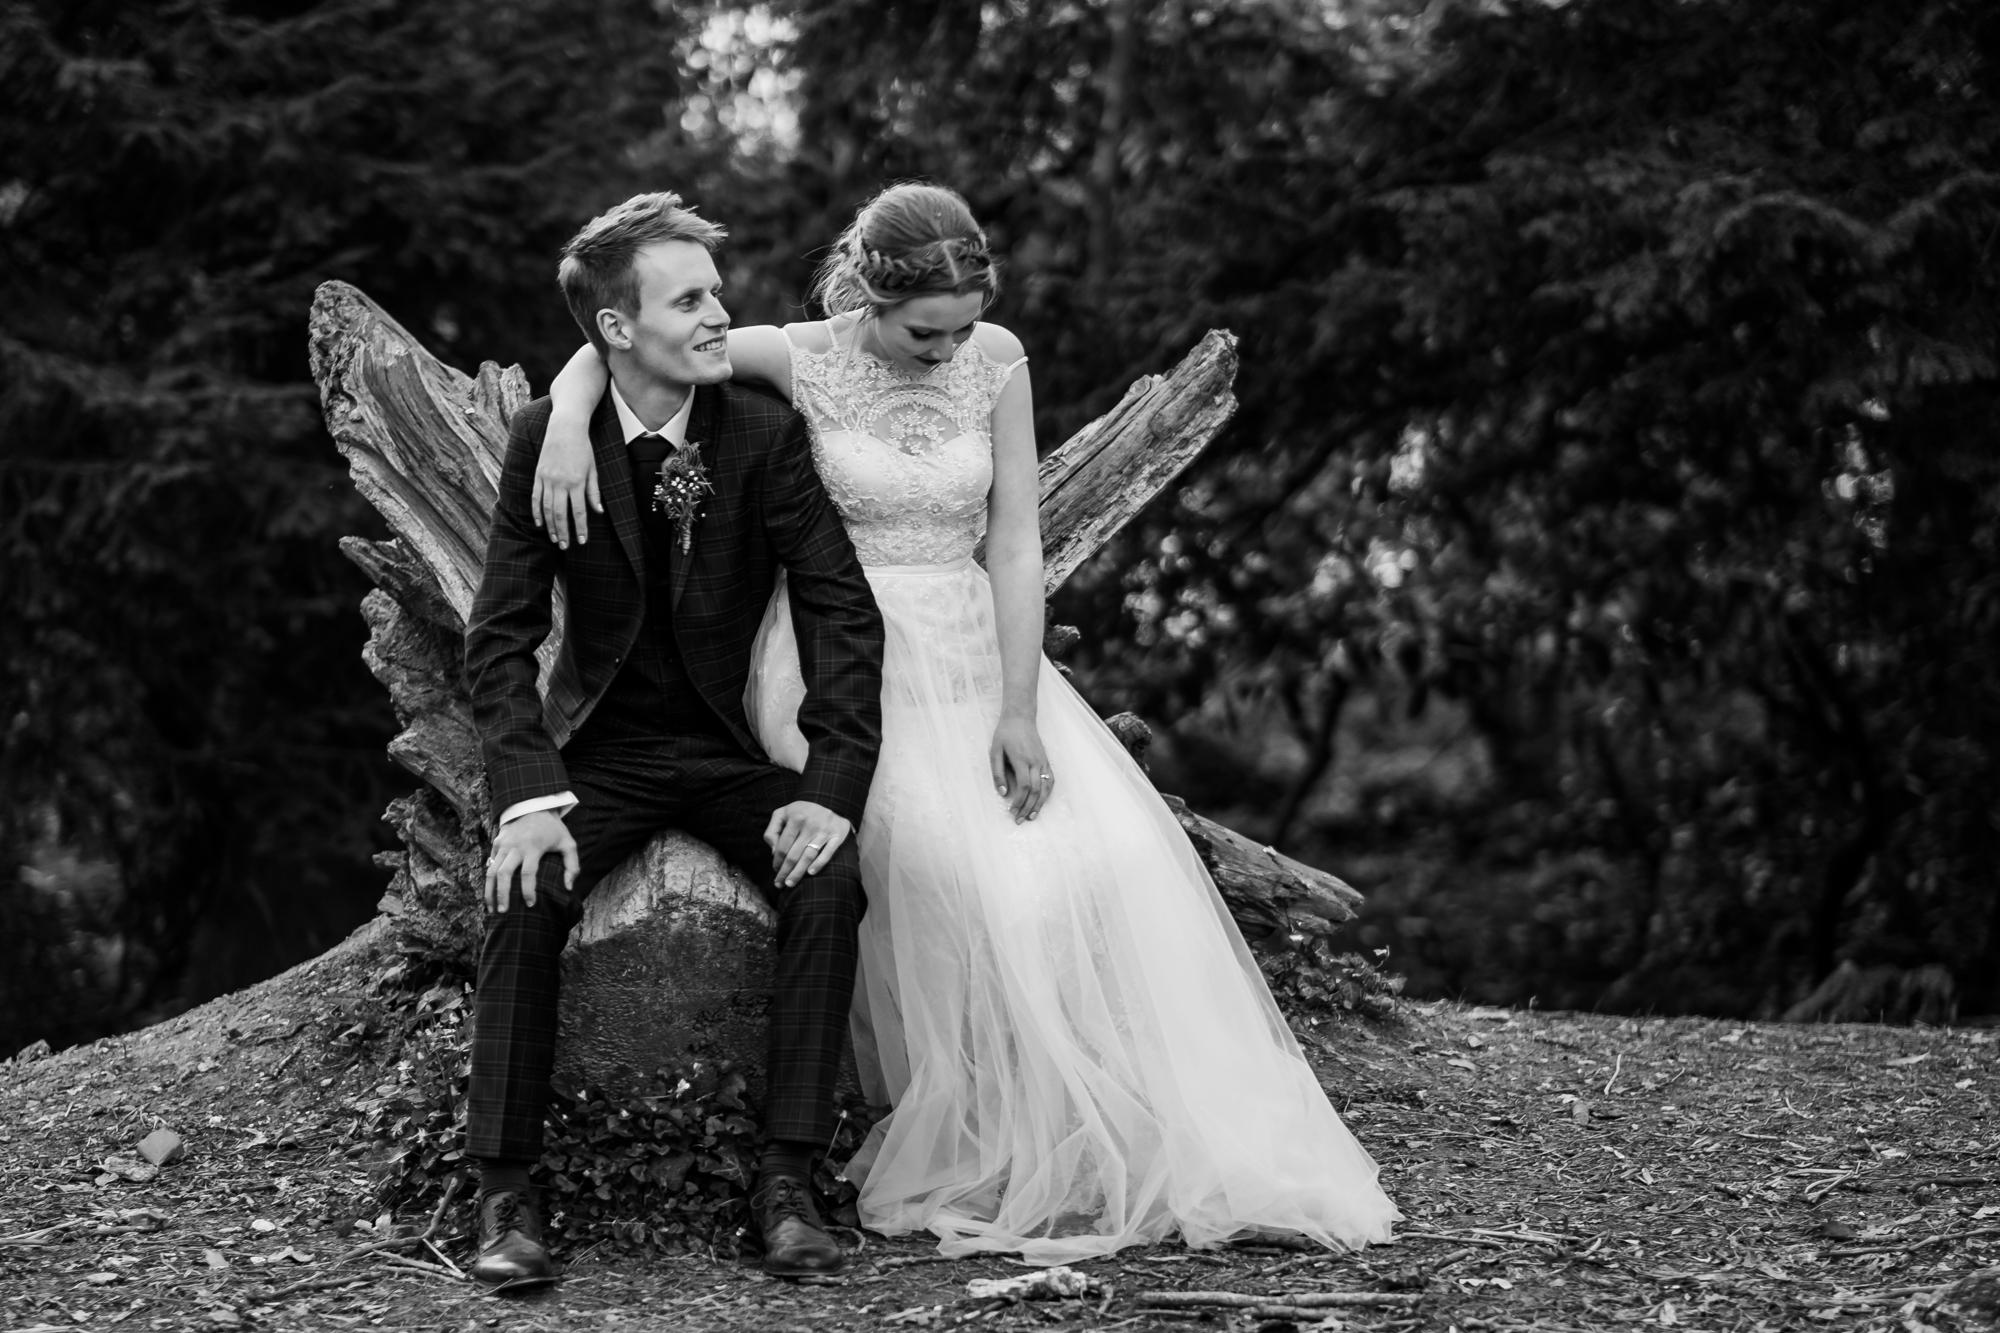 Katie and Dode weddings (181 of 207).jpg